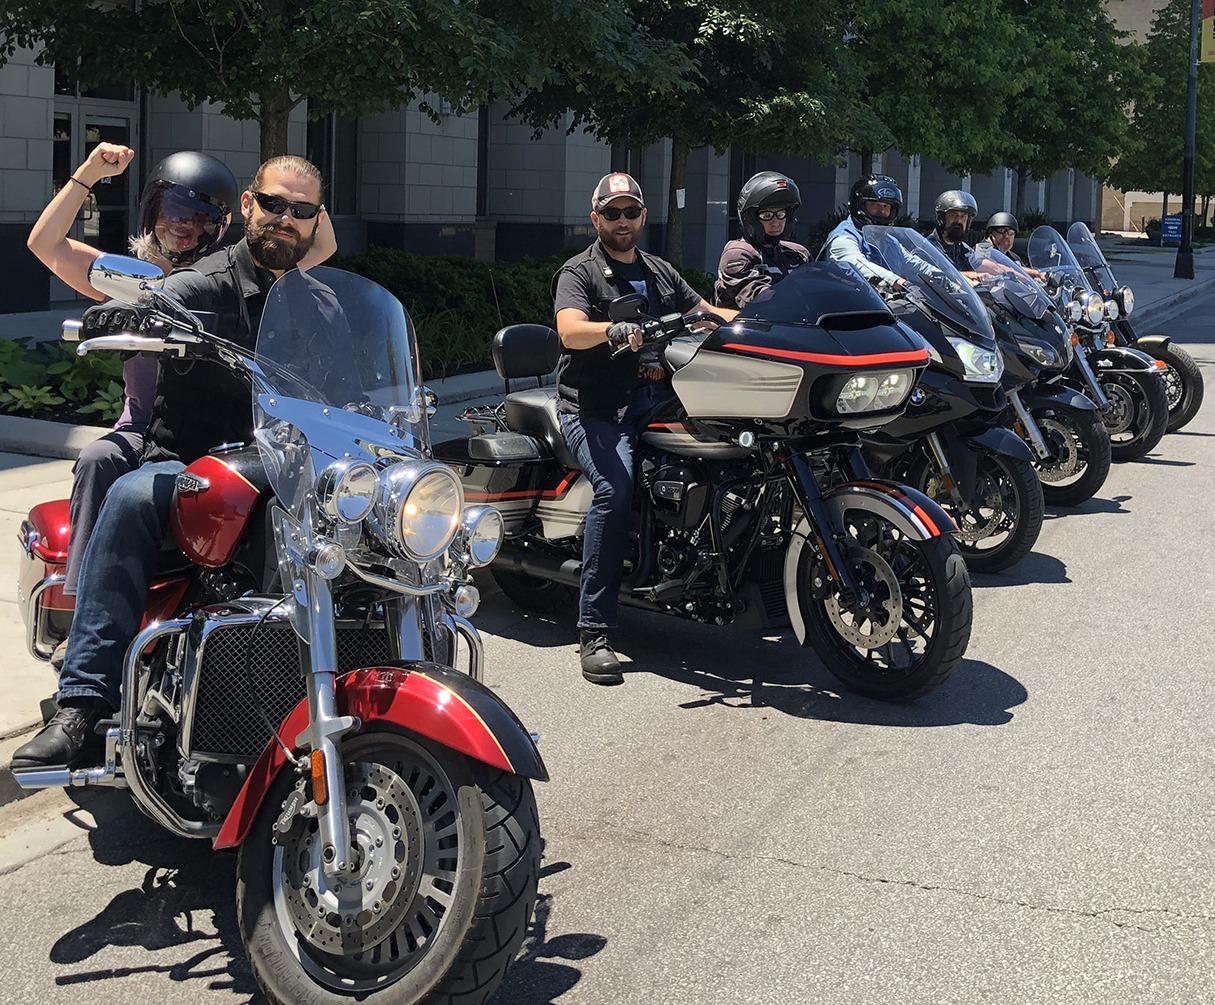 Vegan's Choice Motorcycle Club with Elysabeth Alfano